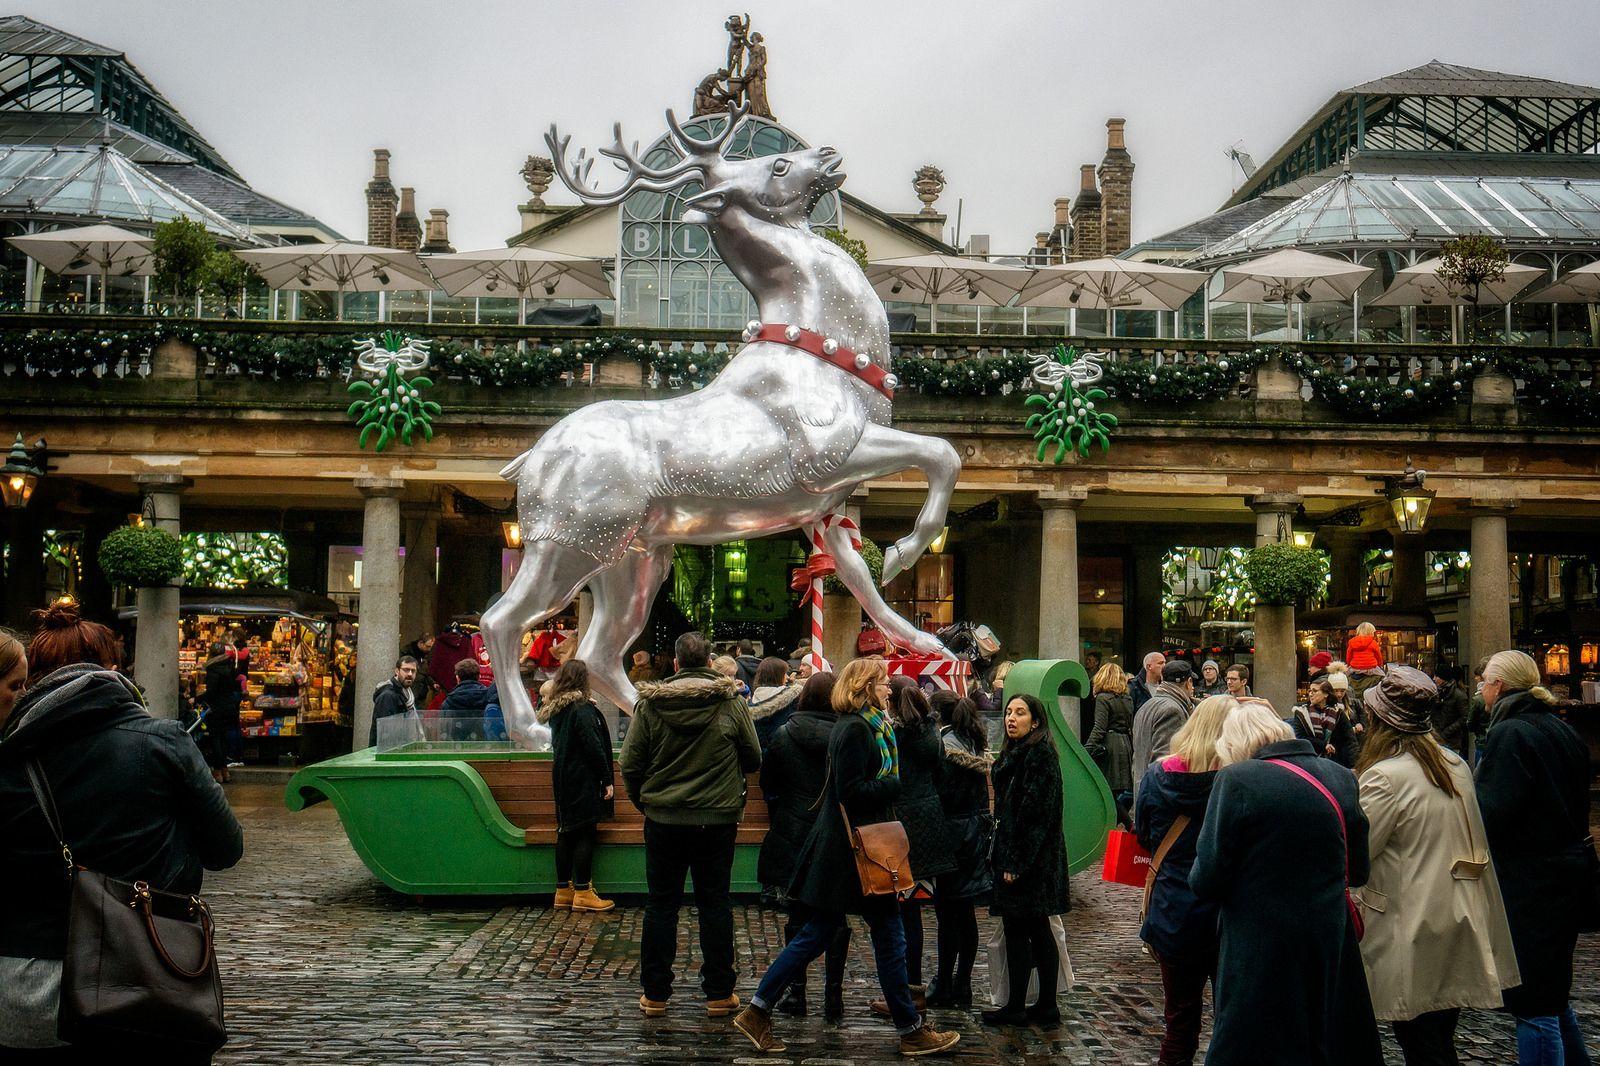 Covent Garden Reindeer Christmas In England English Christmas Reindeer